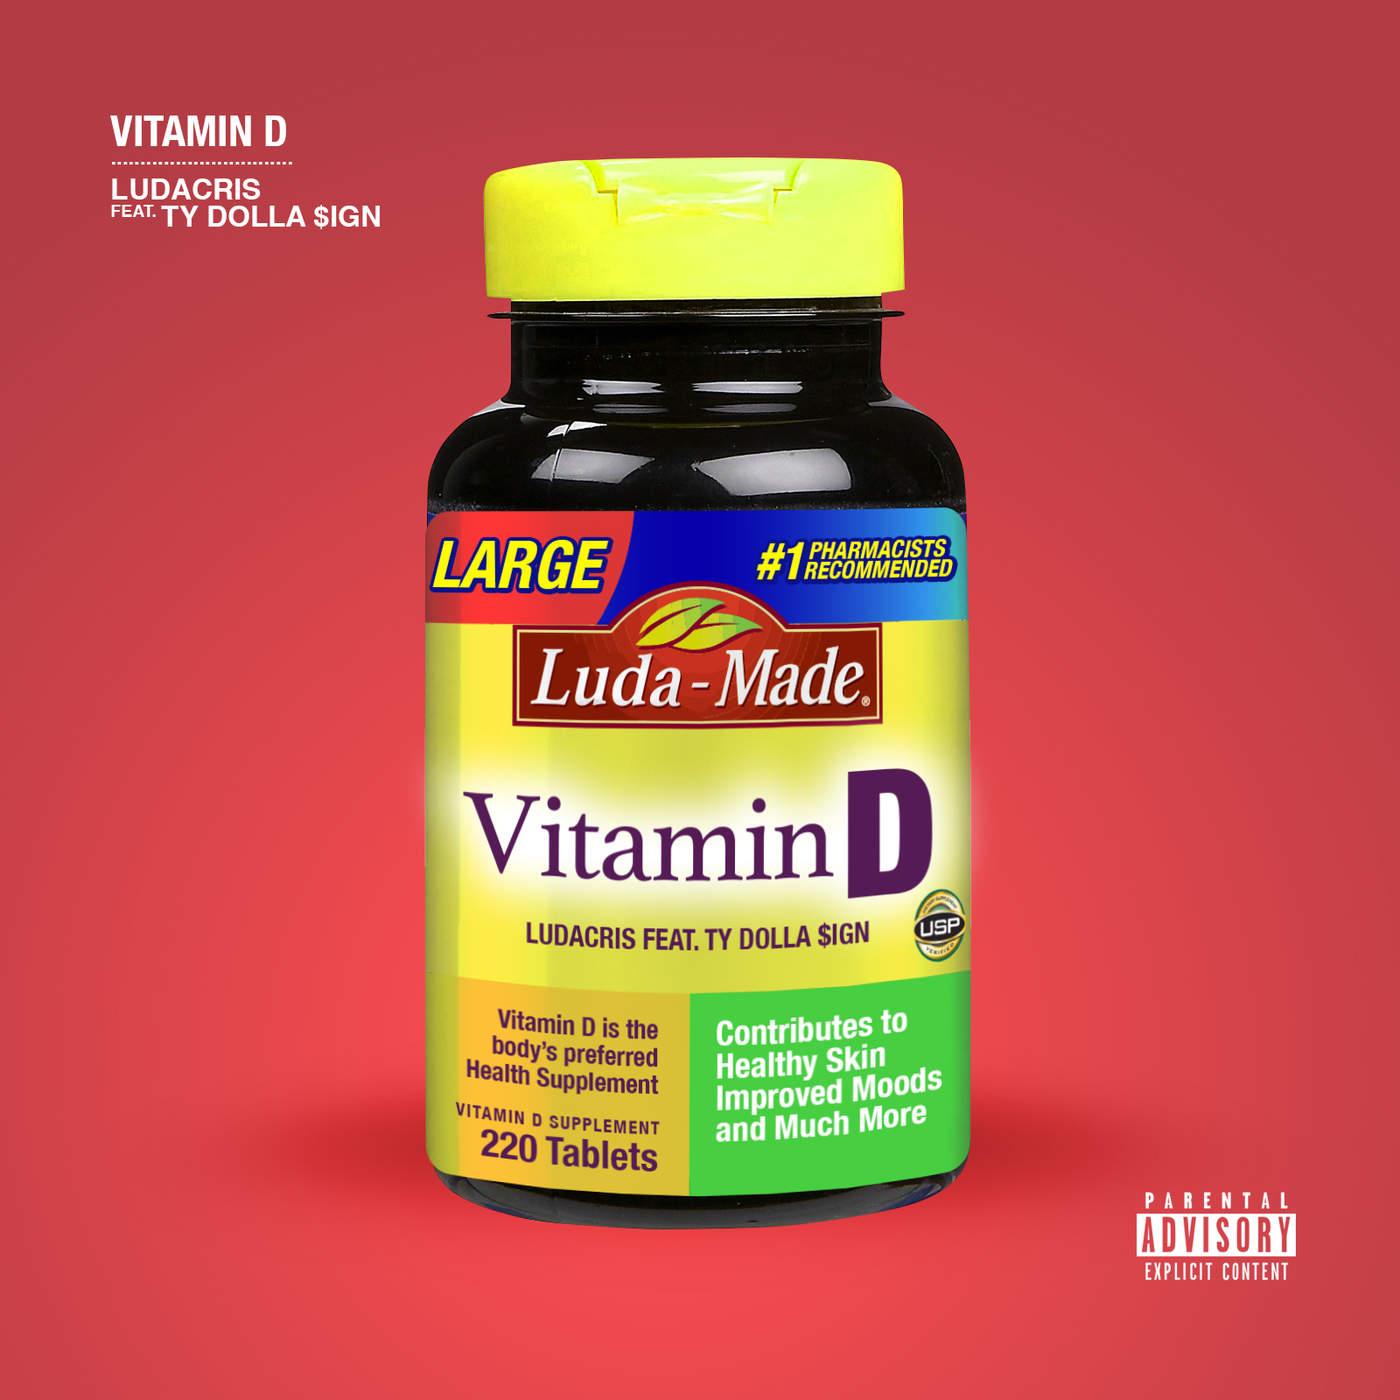 Ludacris - Vitamin D (feat. Ty Dolla $ign) - Single Cover